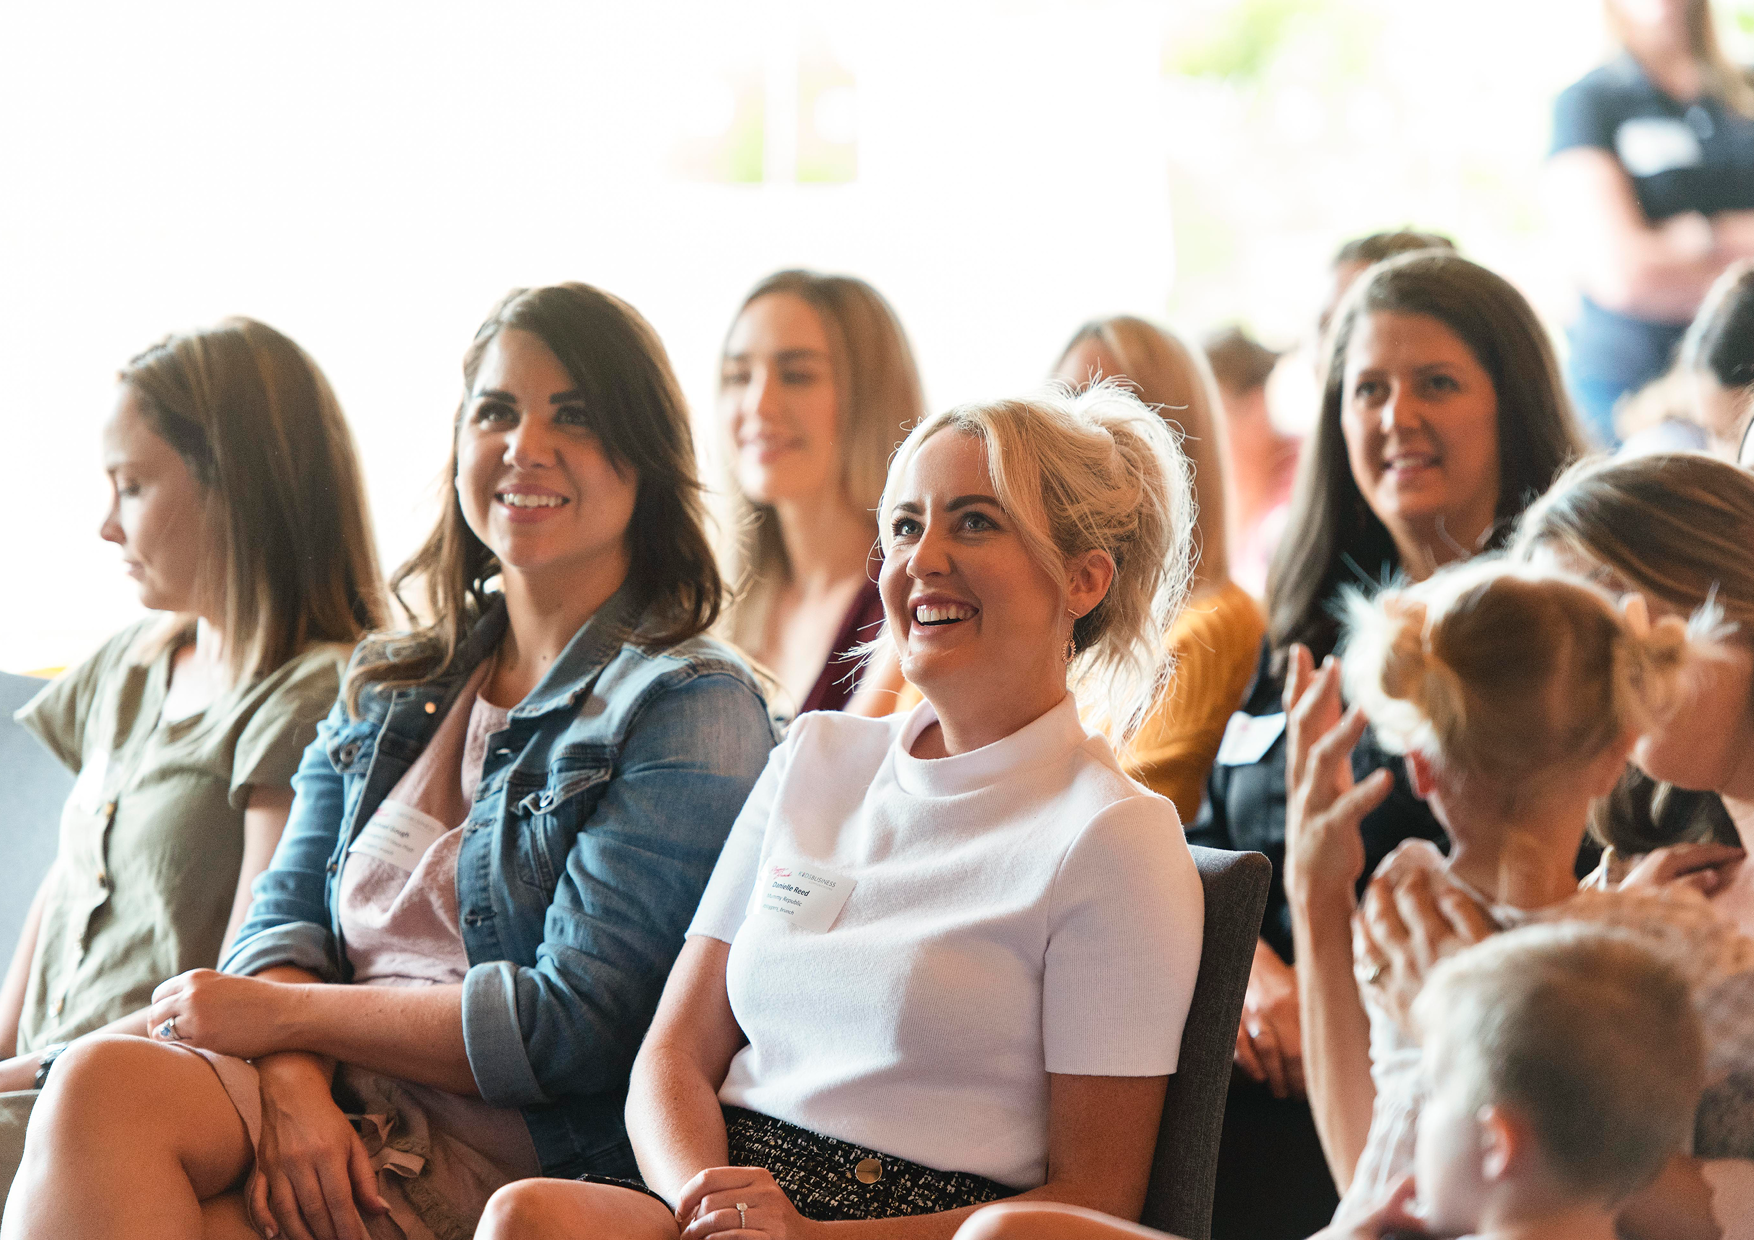 Women influencers sitting down, smiling & enjoying q&a